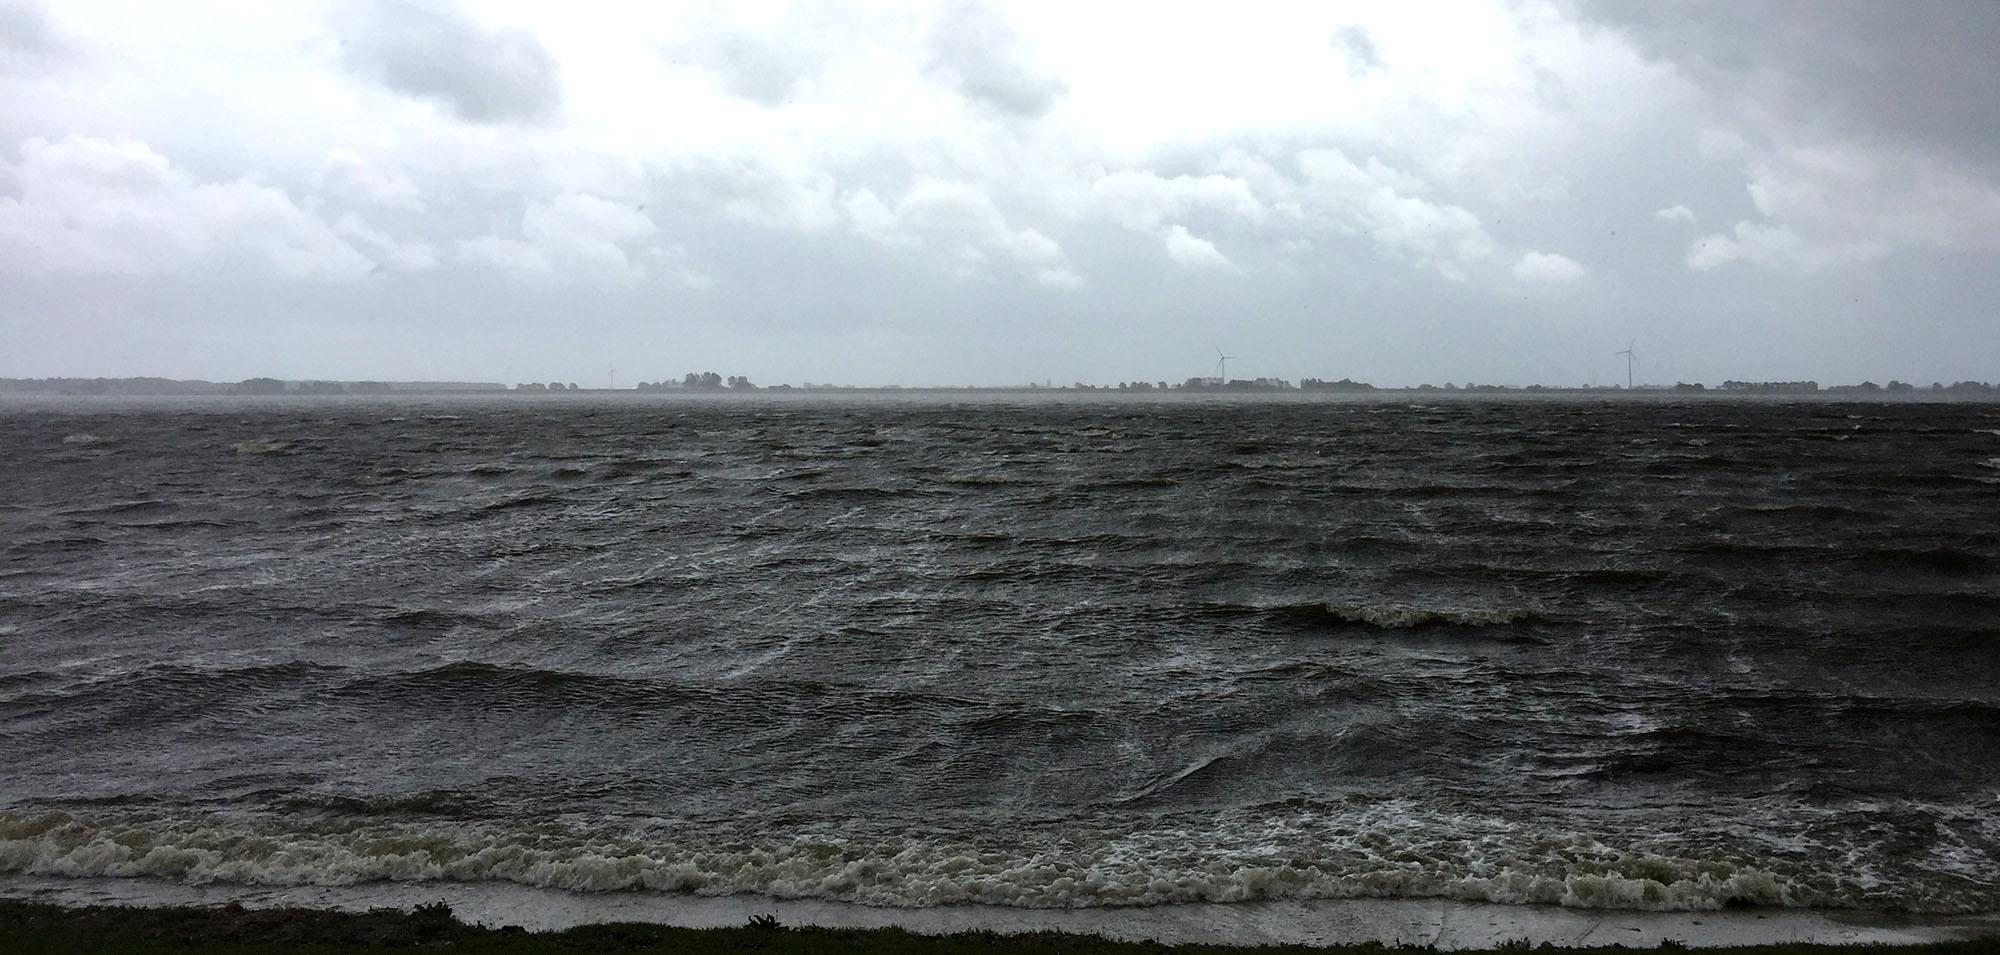 Amstelmeer lutjestrand wind